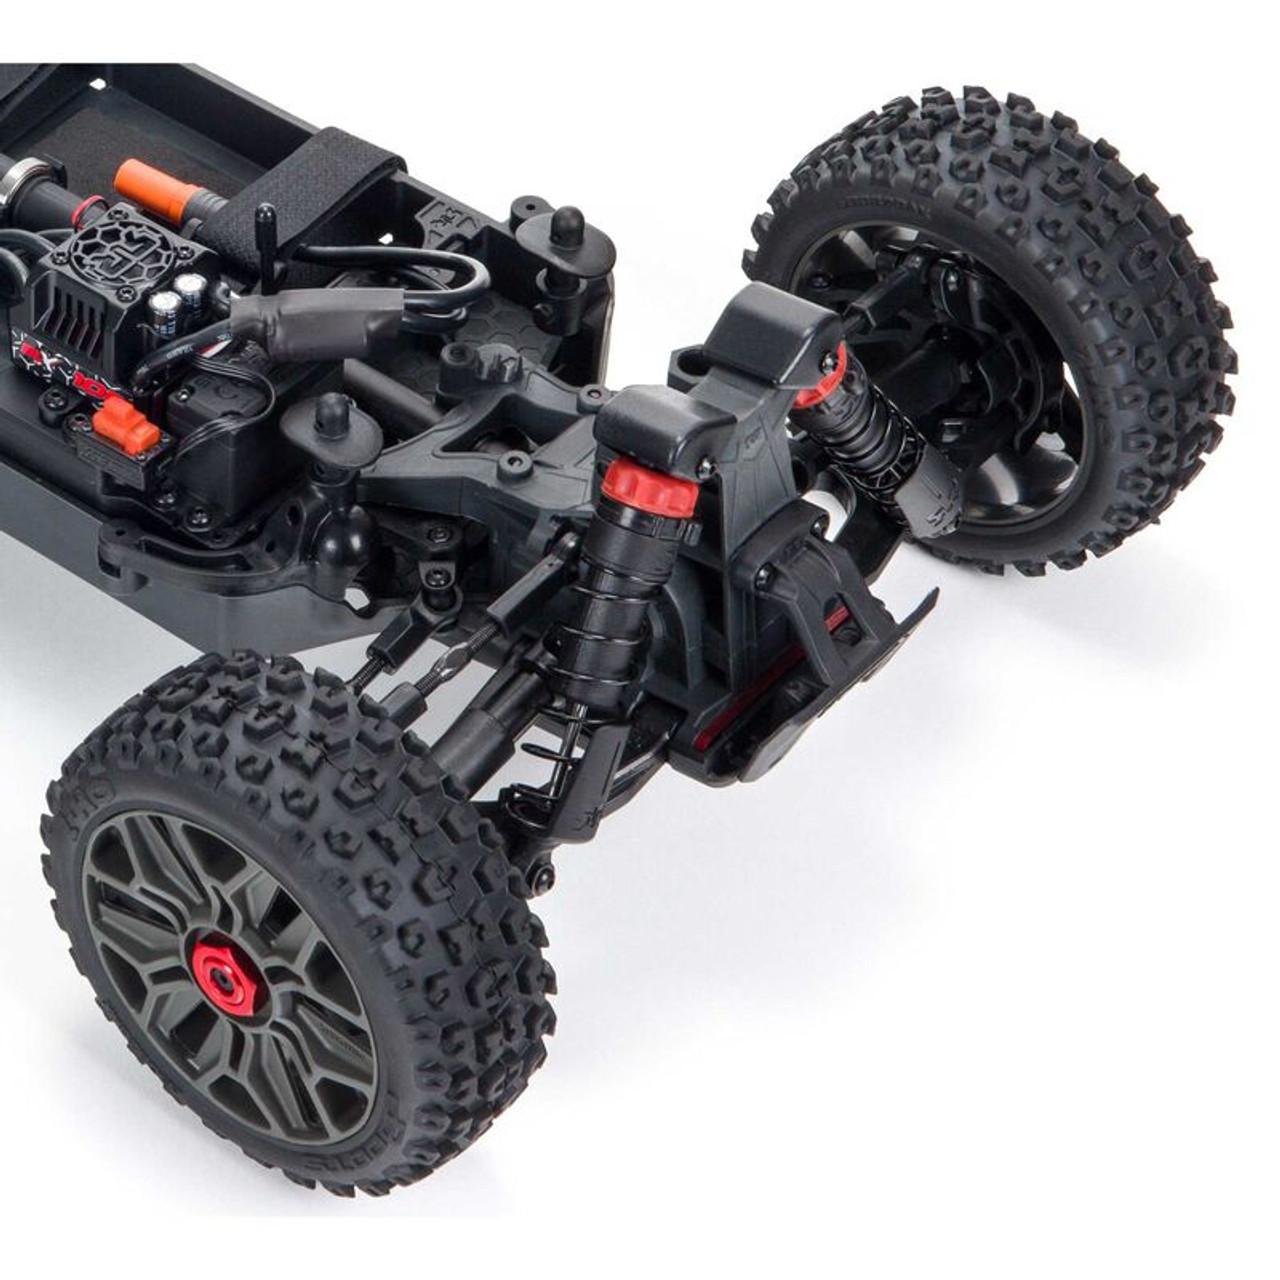 Arrma Typhon V3 3S BLX Brushless RTR 1/8 4WD Buggy (Red) w/Spektrum SLT3 2.4GHz Radio